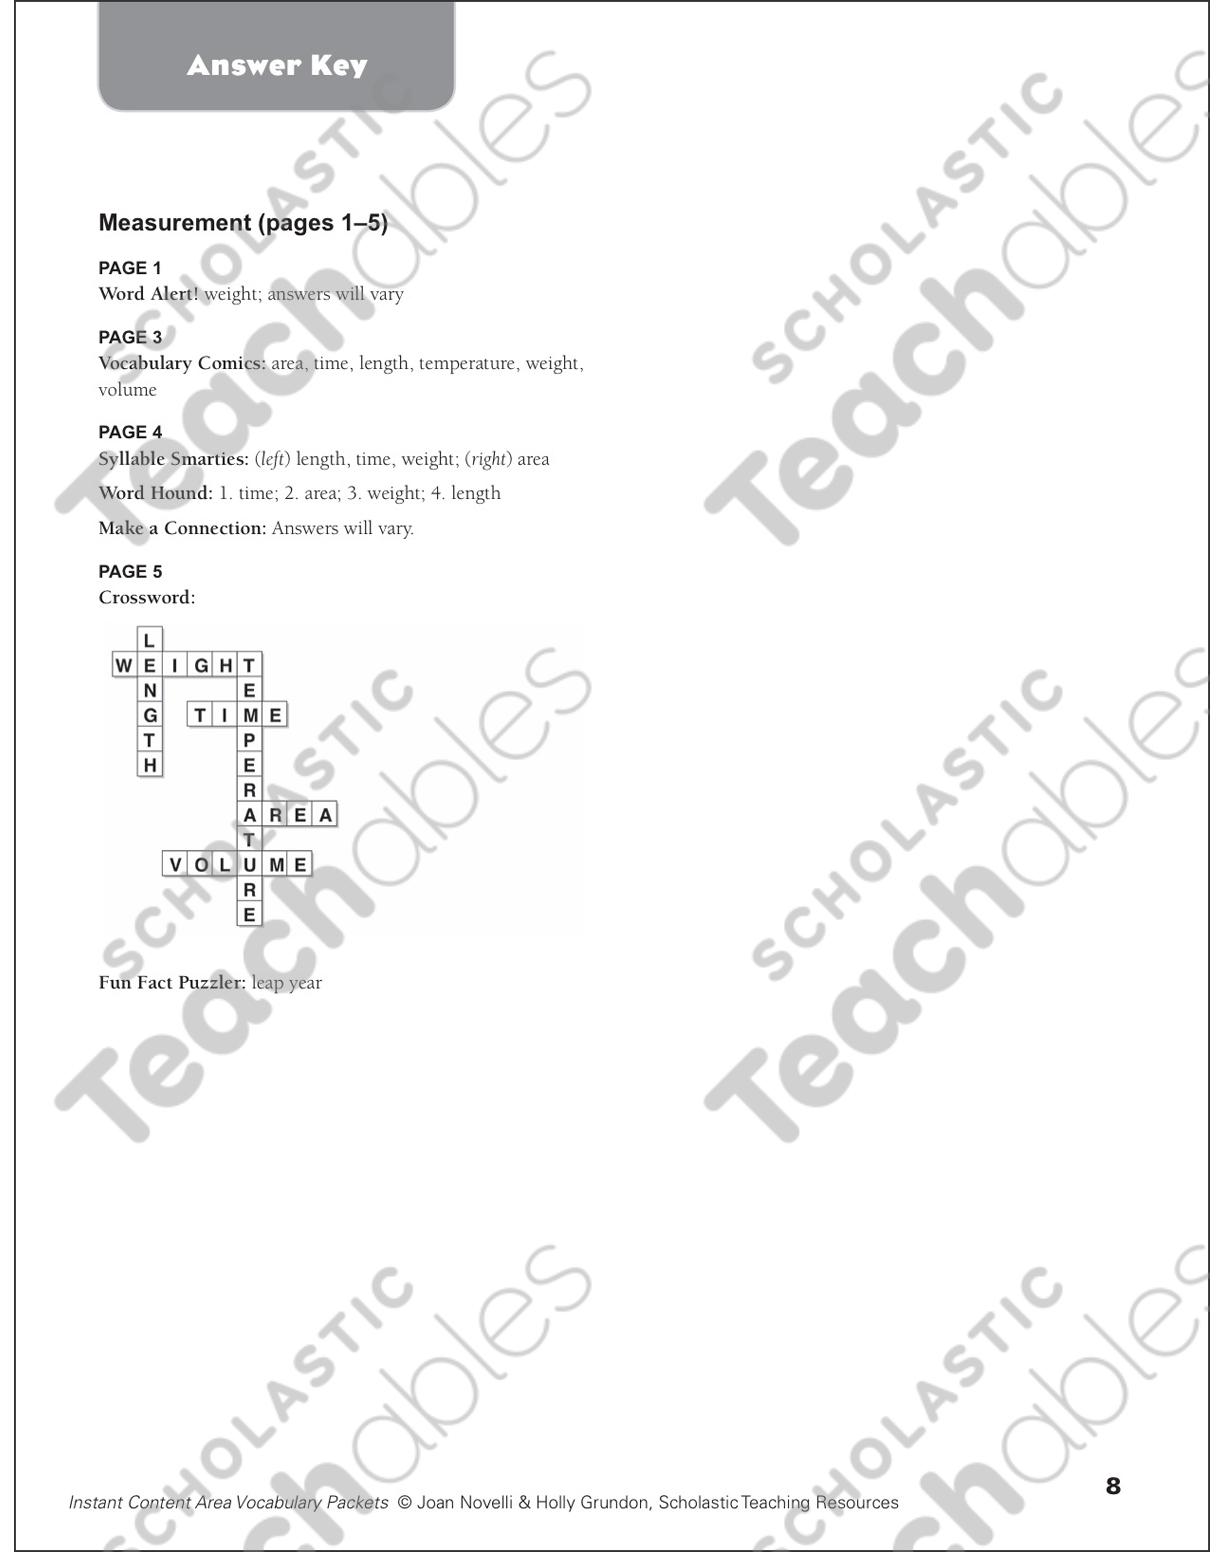 measurement math vocabulary printable skills sheets Design Word see inside image